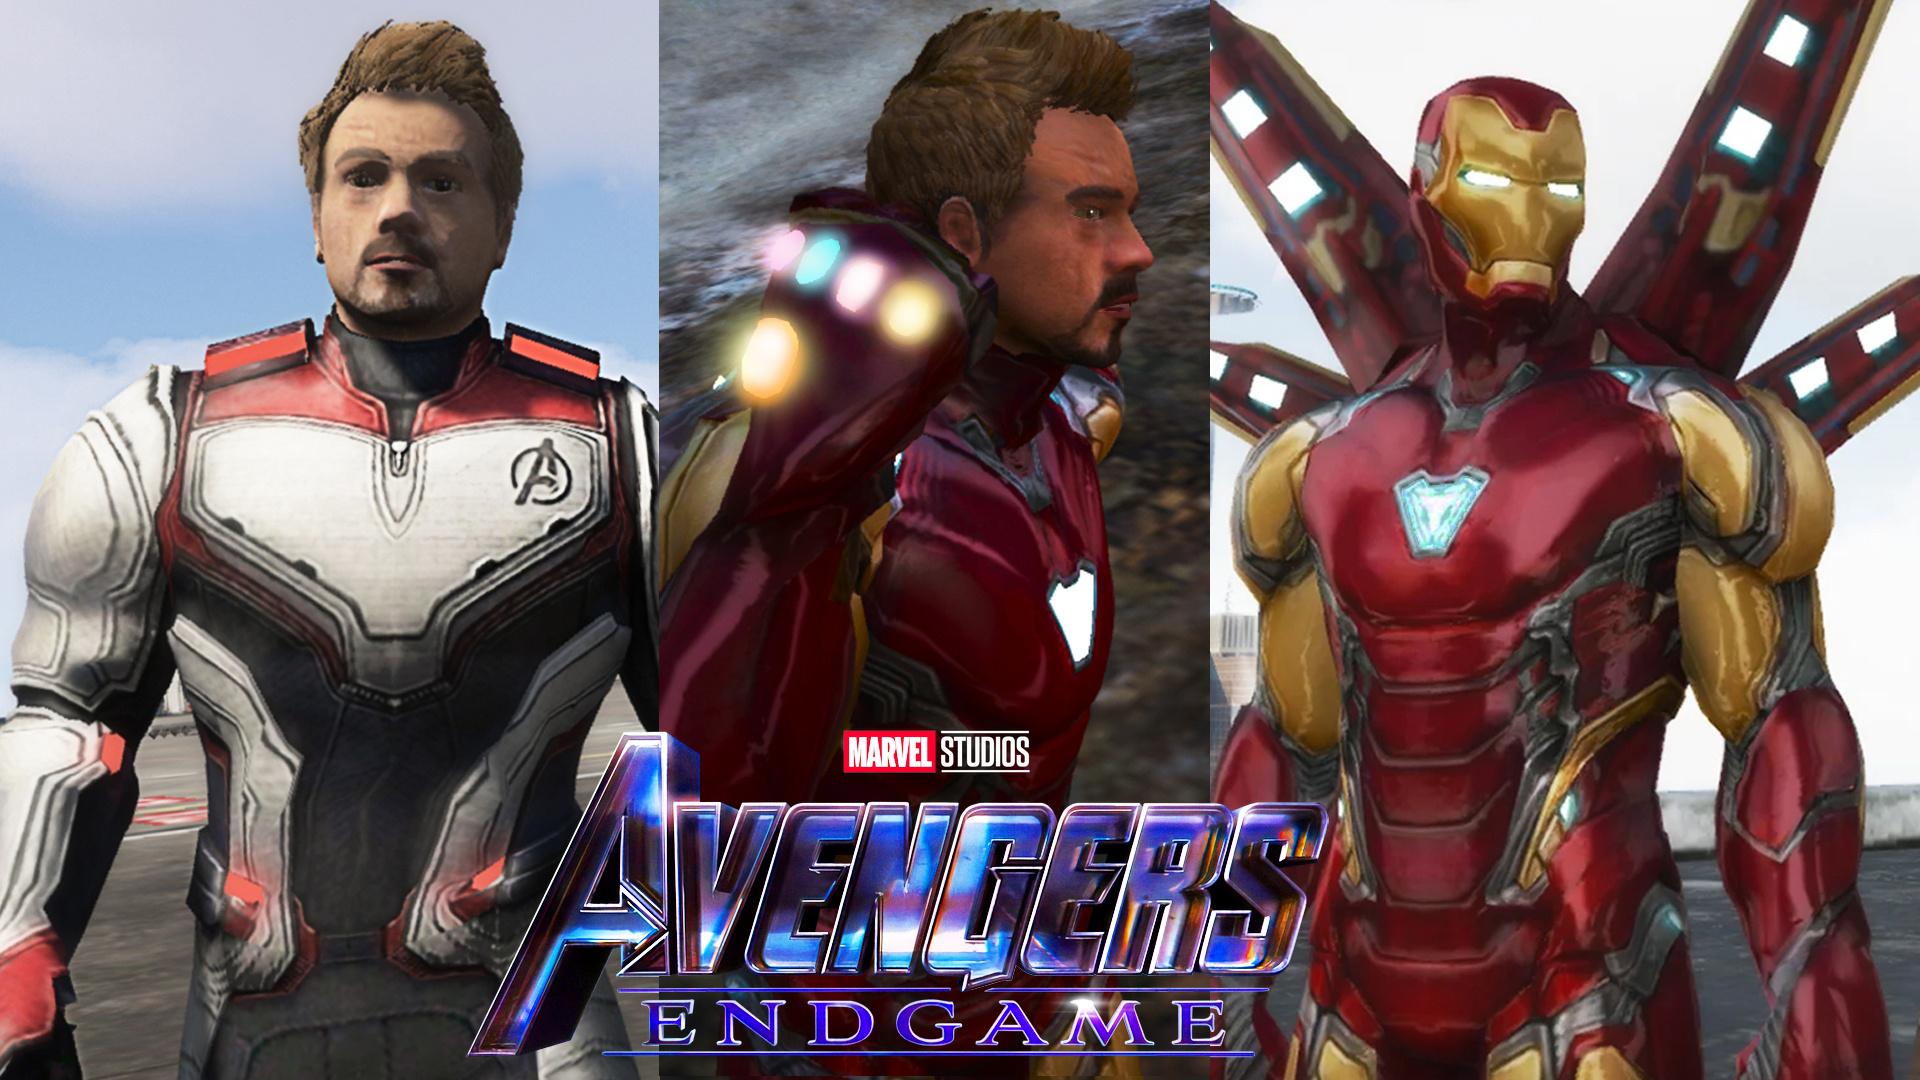 Iron Man MK85 Avengers Endgame - GTA5-Mods com